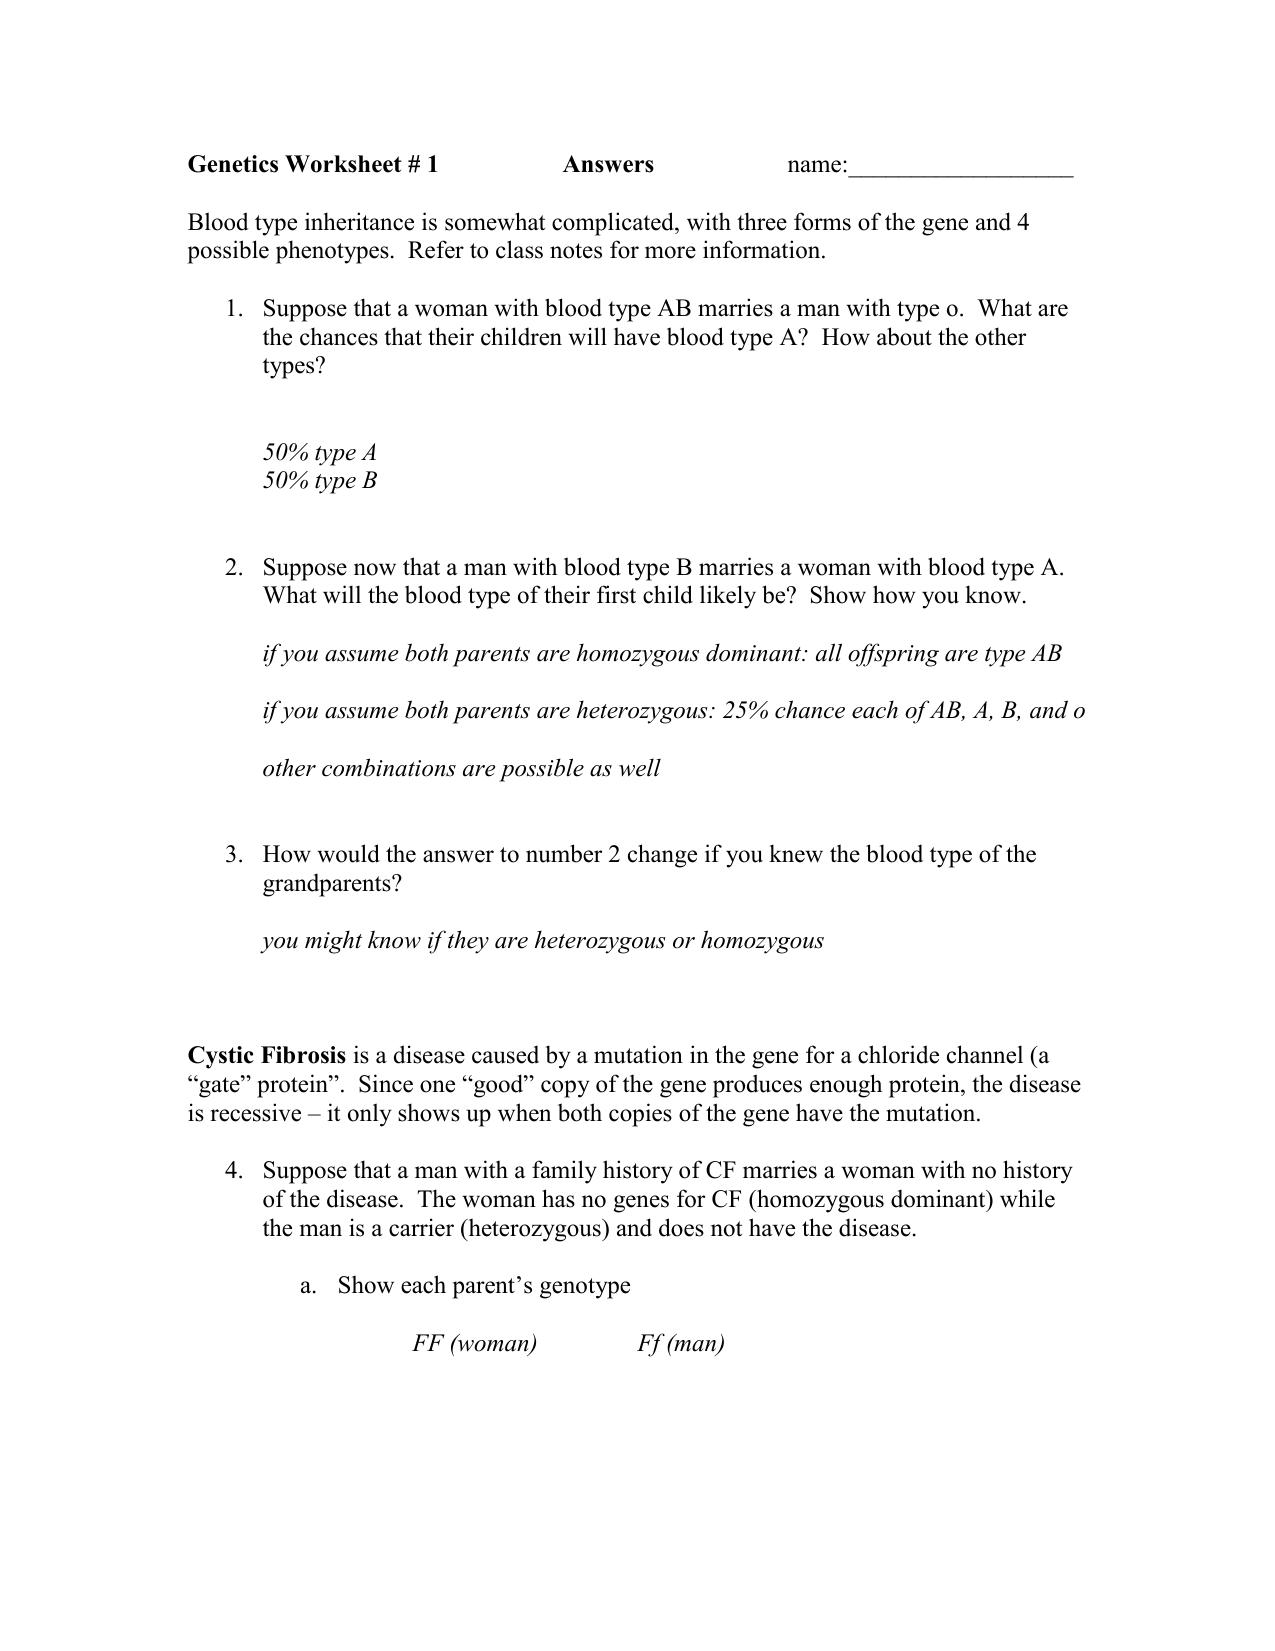 Genetics Worksheet Answers